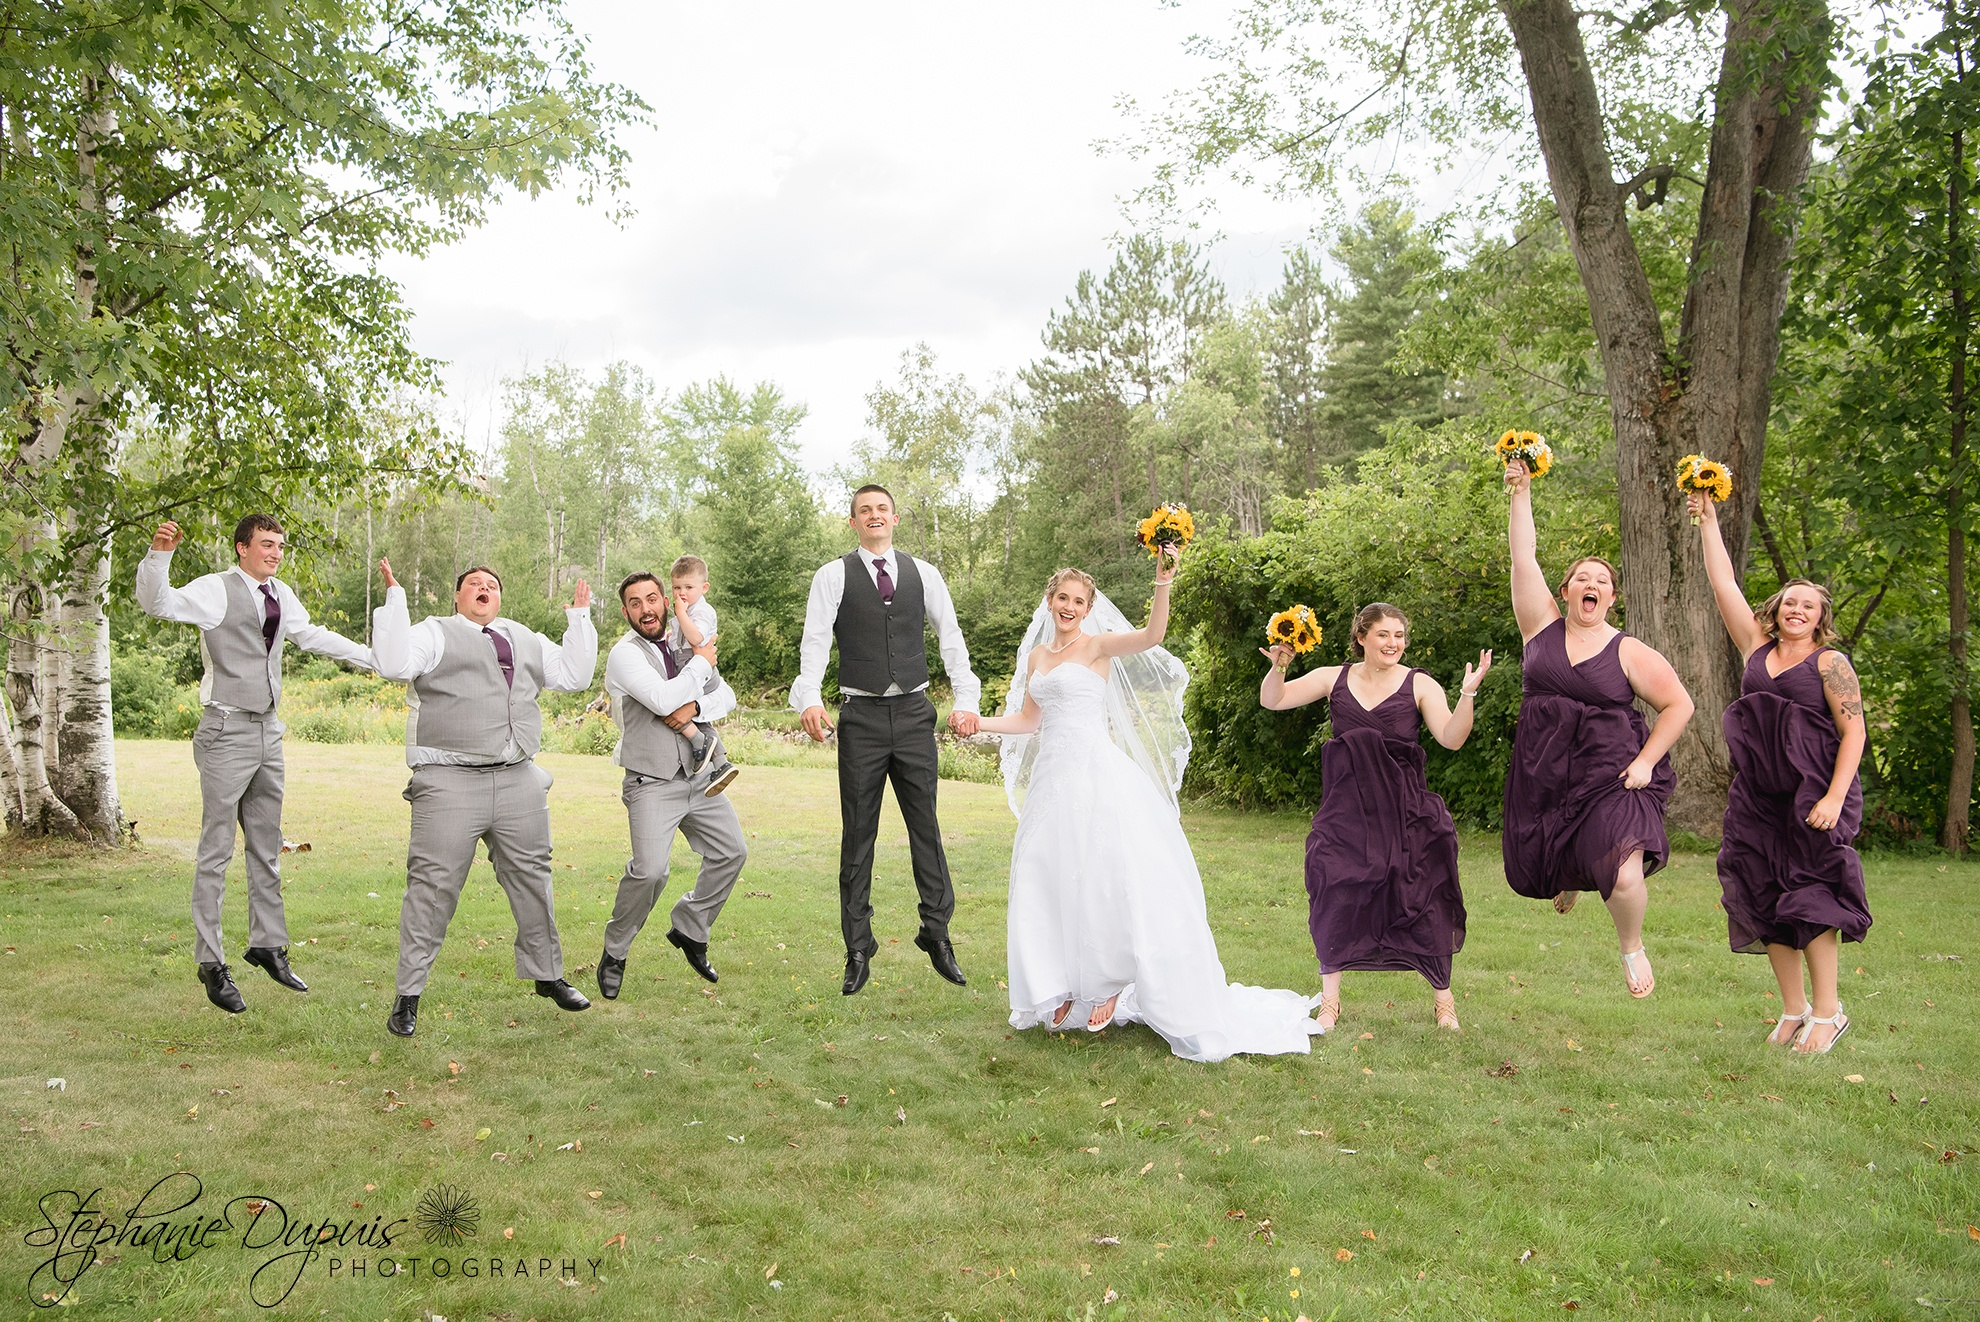 Jefferson Wedding Photographer 01 1 - Portfolio: Ward Wedding